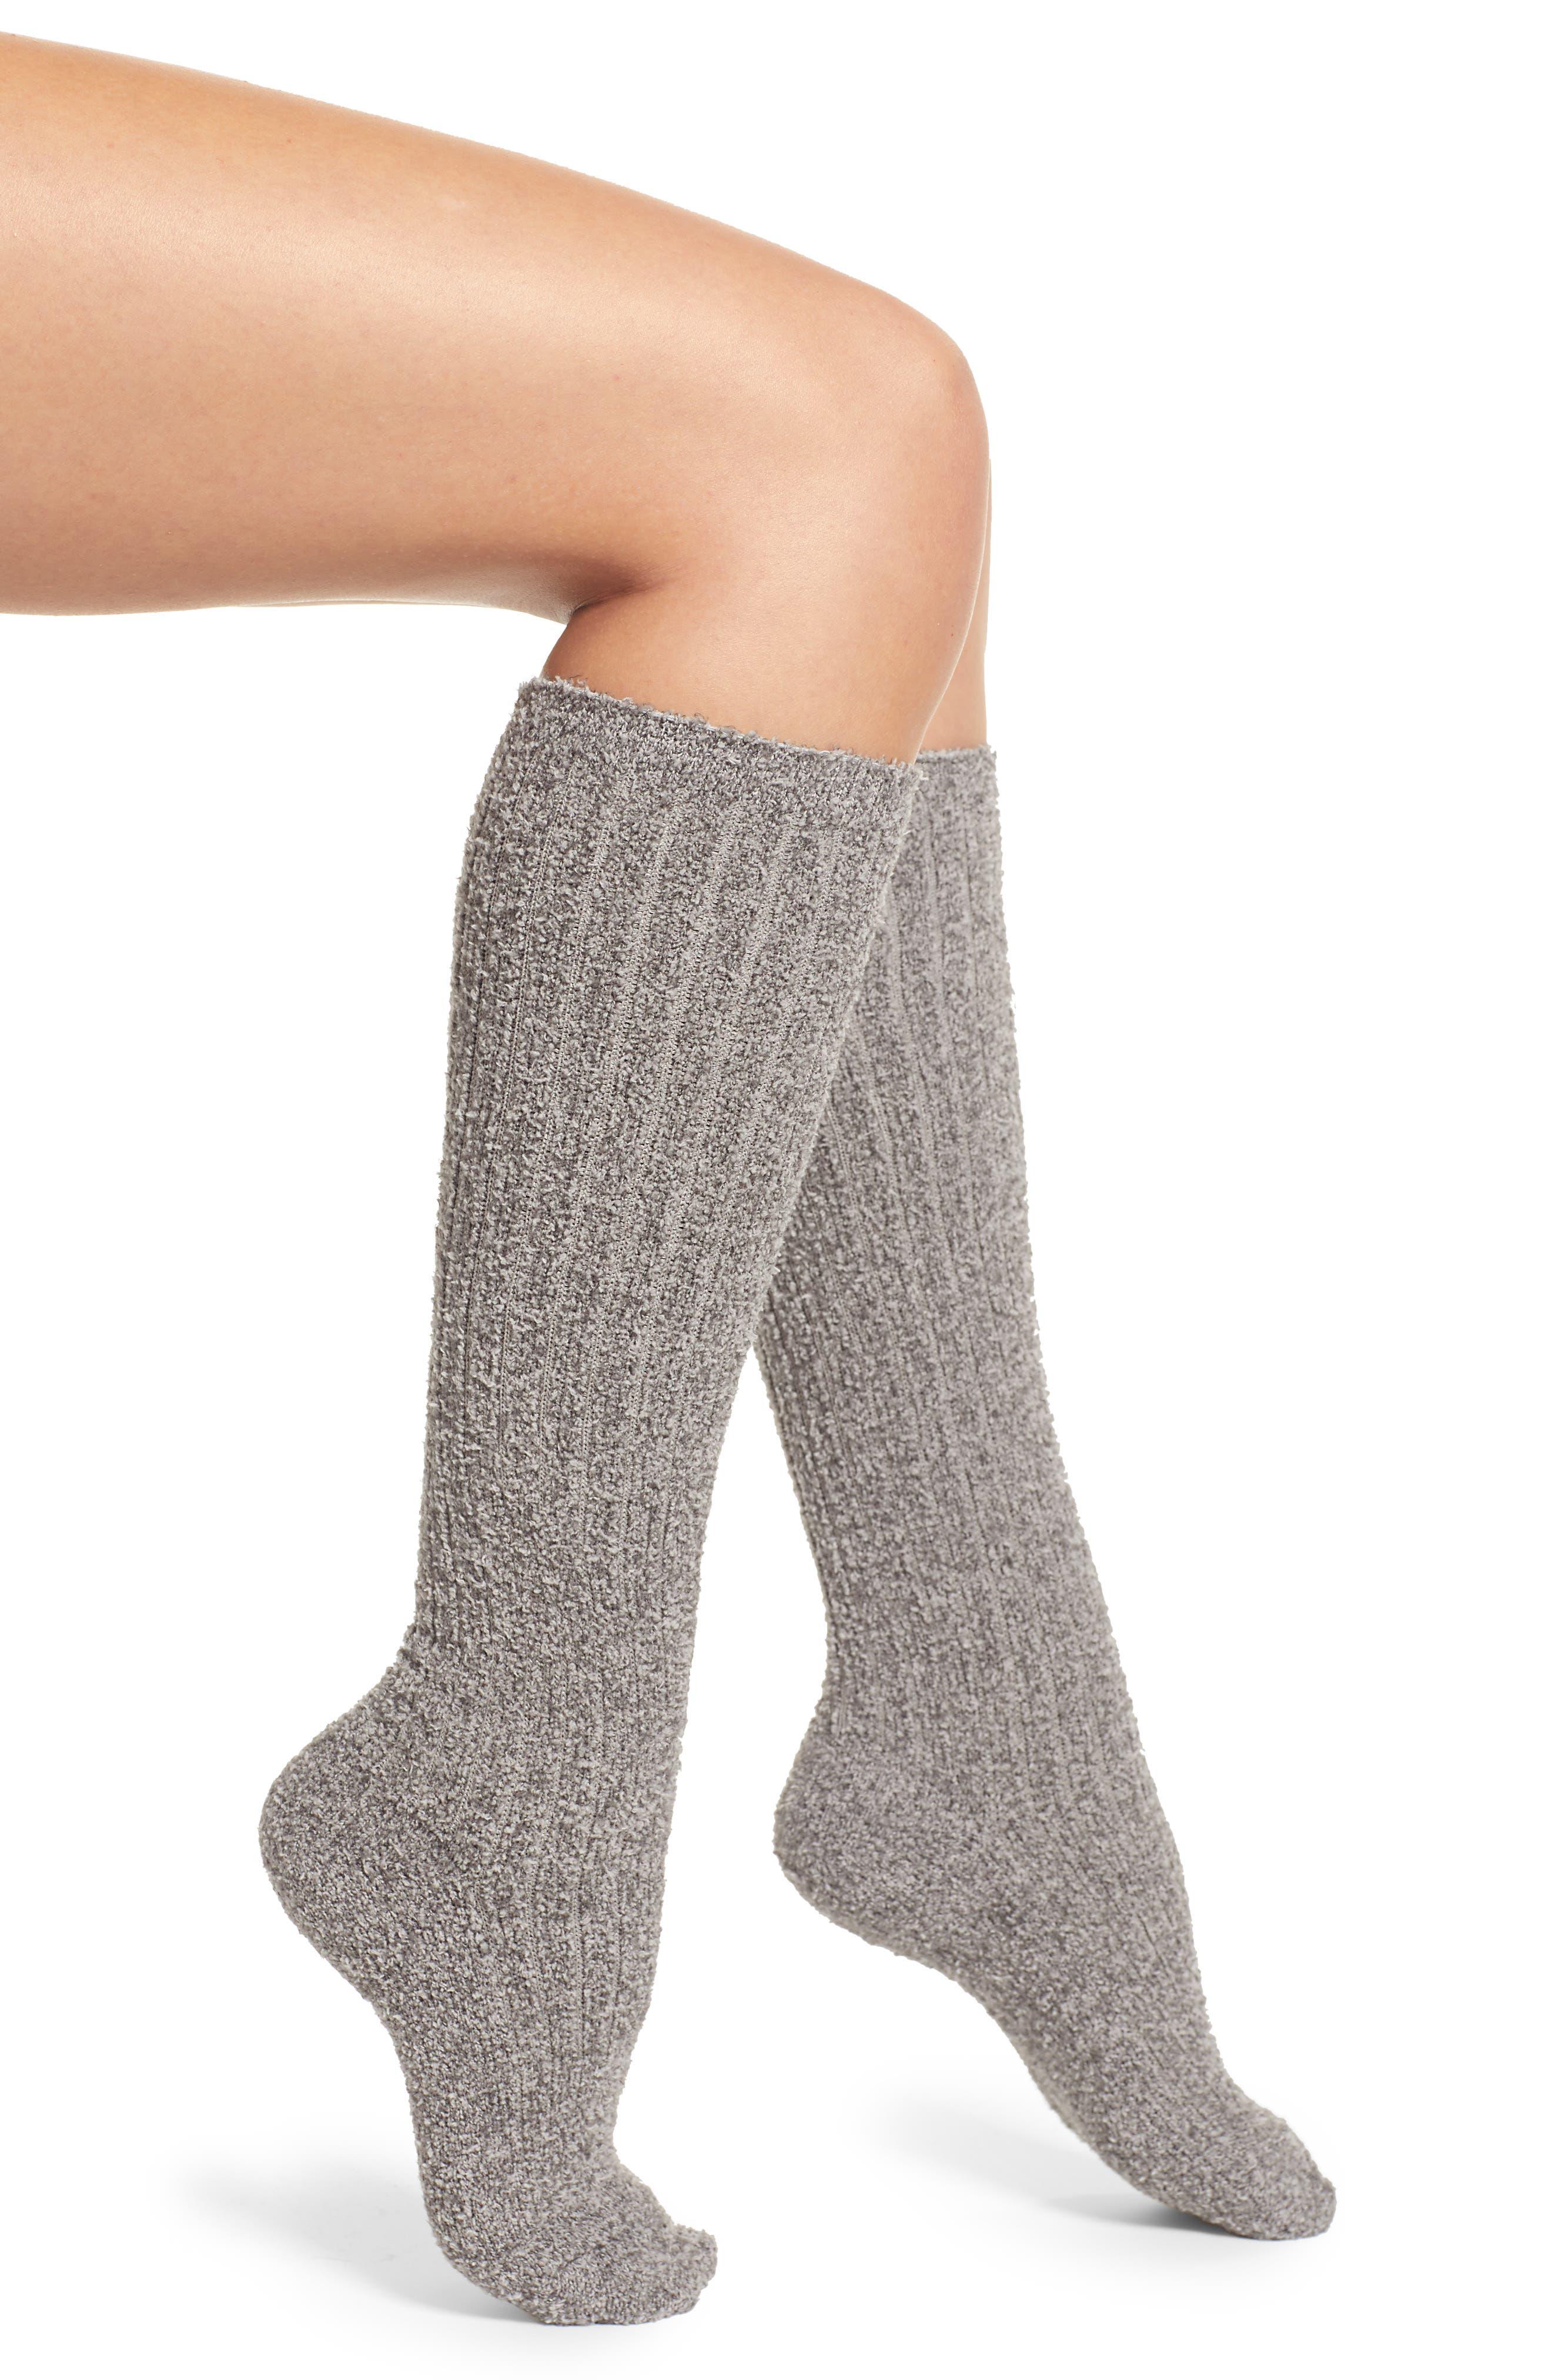 Vintage Socks | 1920s, 1930s, 1940s, 1950s, 1960s History Womens Barefoot Dreams CozychicTM Rib Knee High Socks Size One Size - Grey $18.00 AT vintagedancer.com